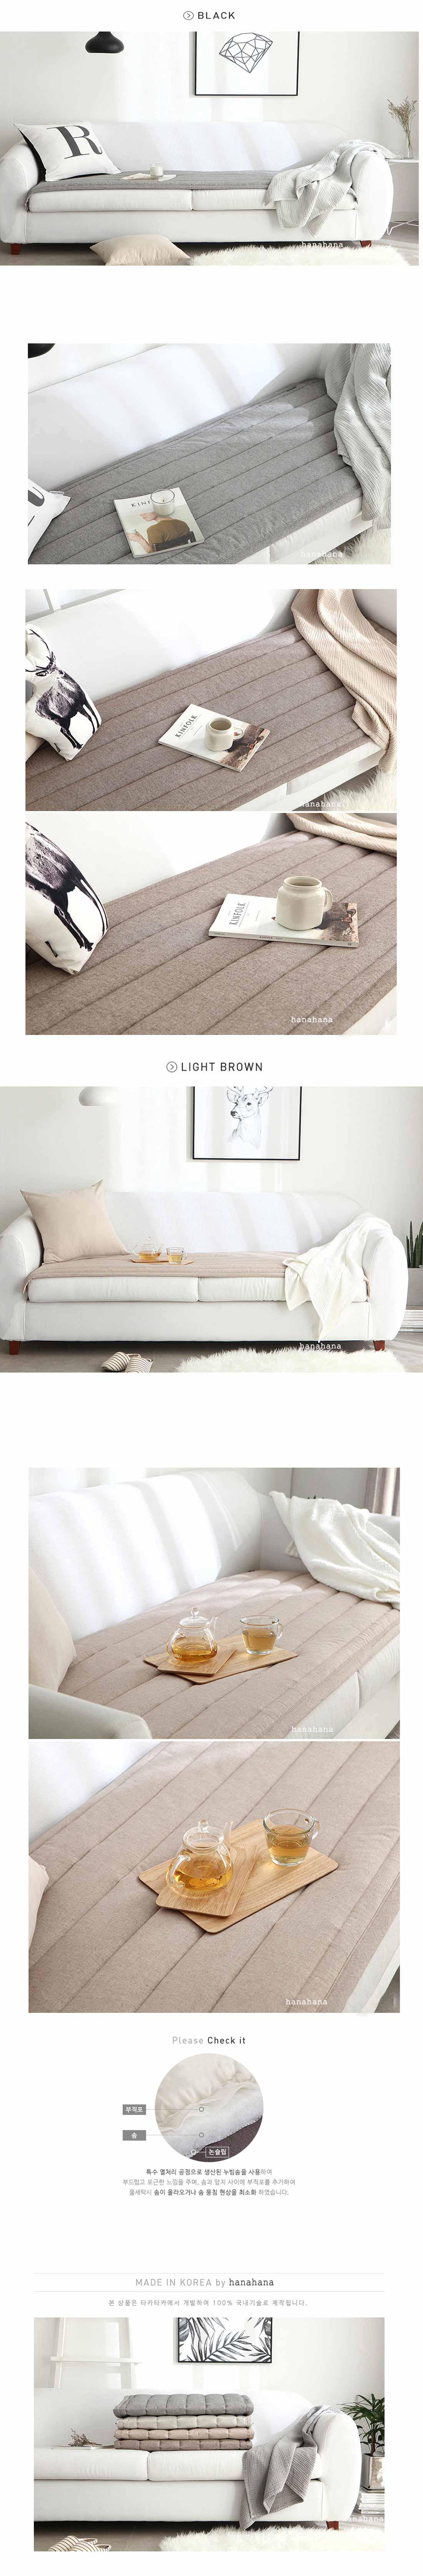 Drap trải sofa hàn Quốc